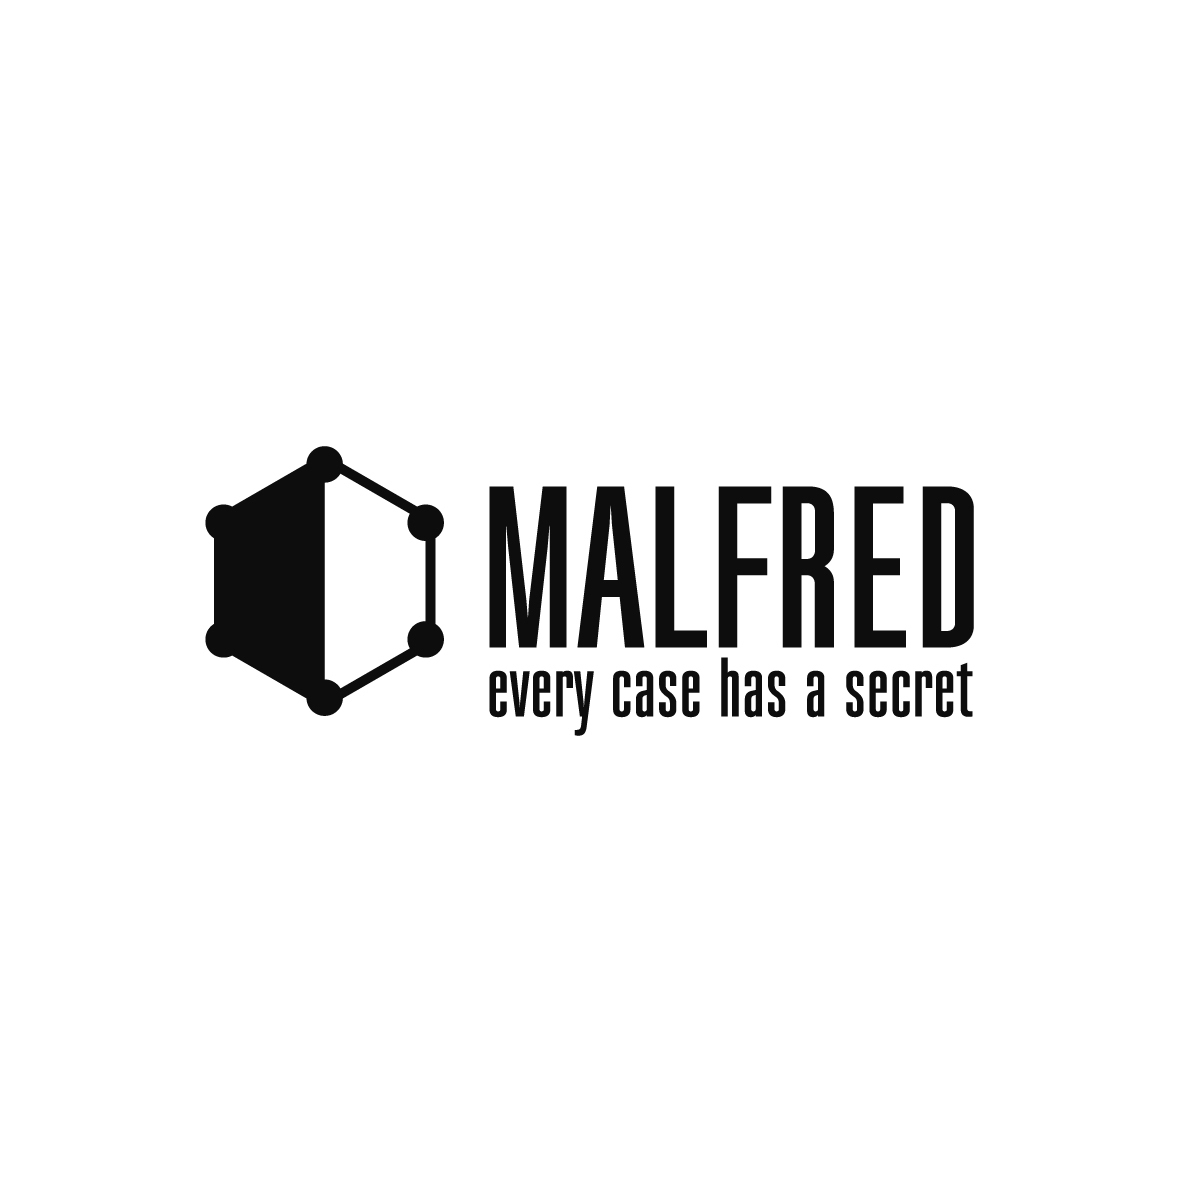 Malfred